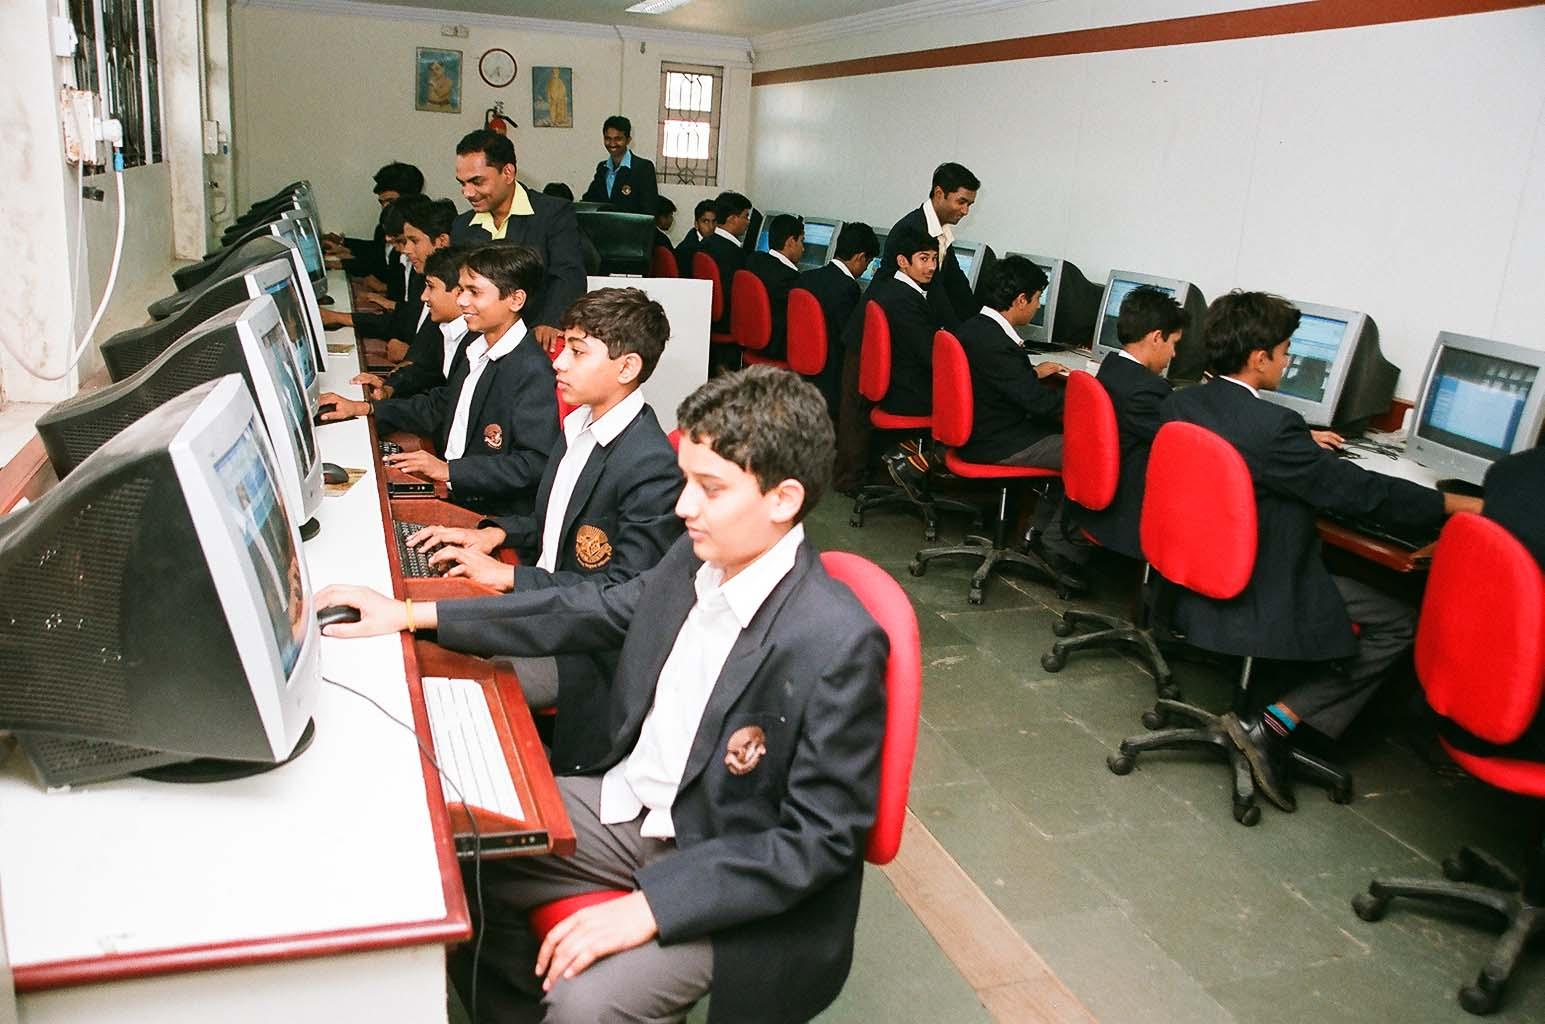 education computer education computer education